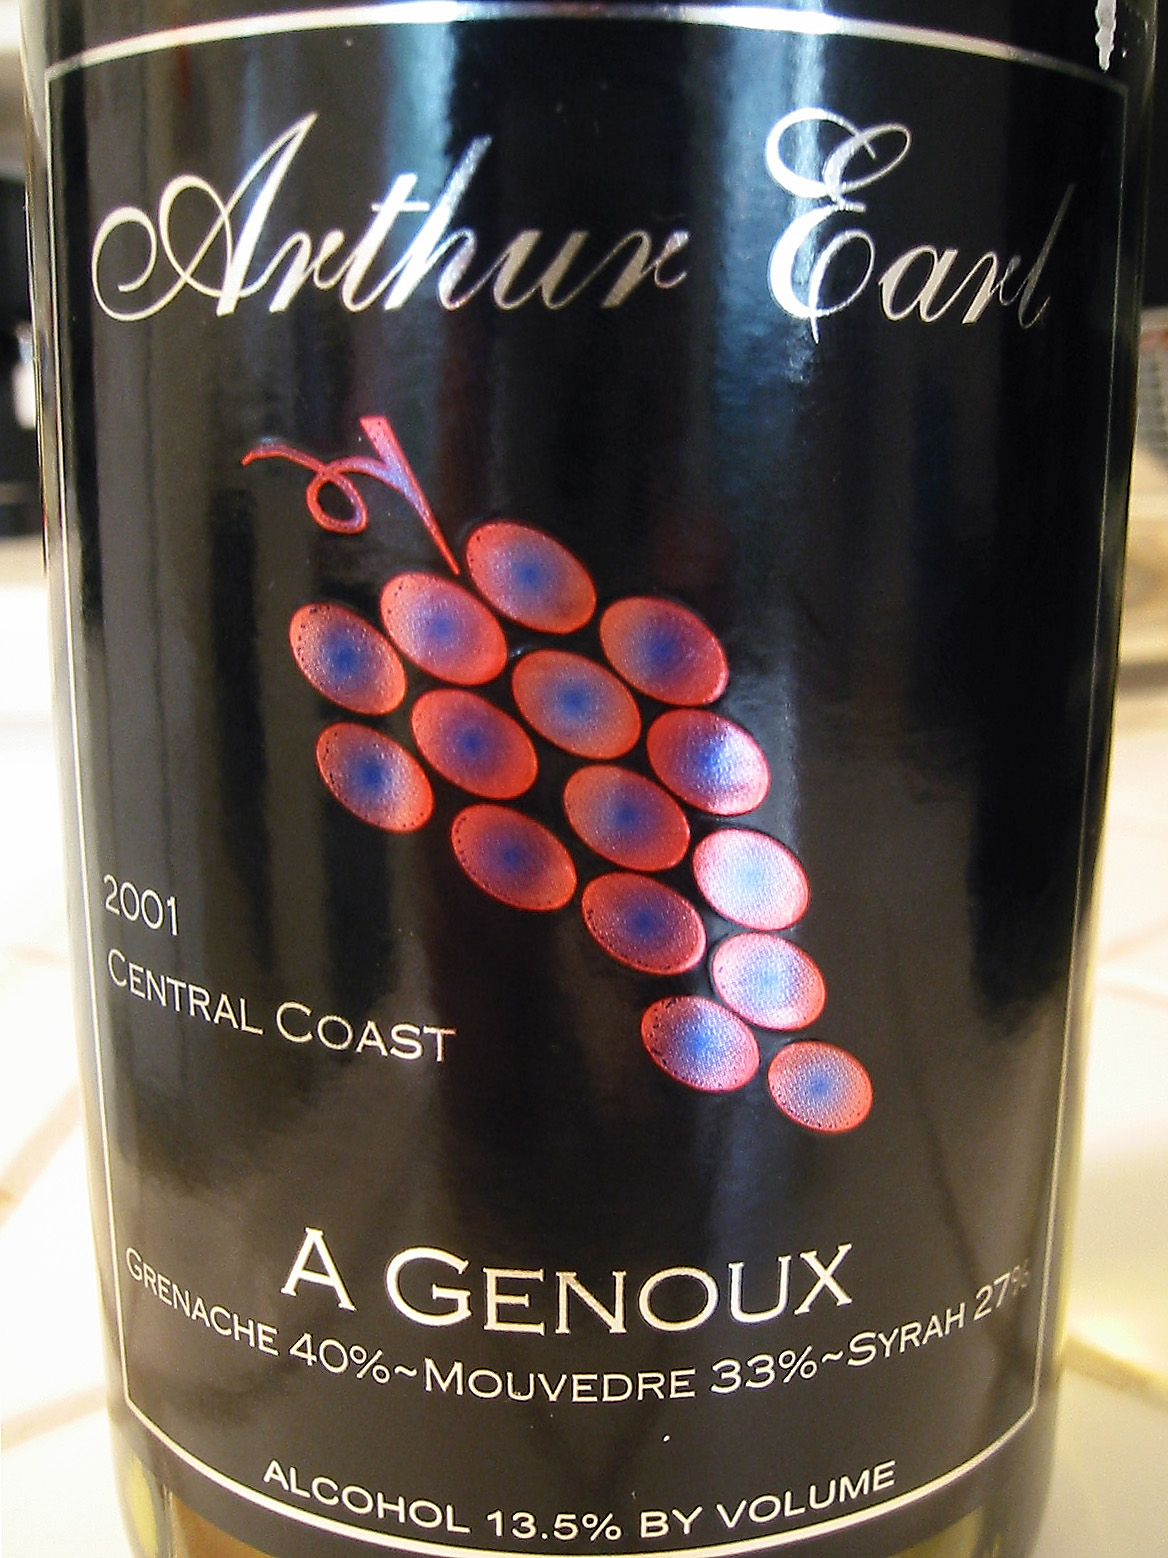 2001 Arthur Earl Central Coast A Genoux Santa Barbara County Wine Recipes Alcohol